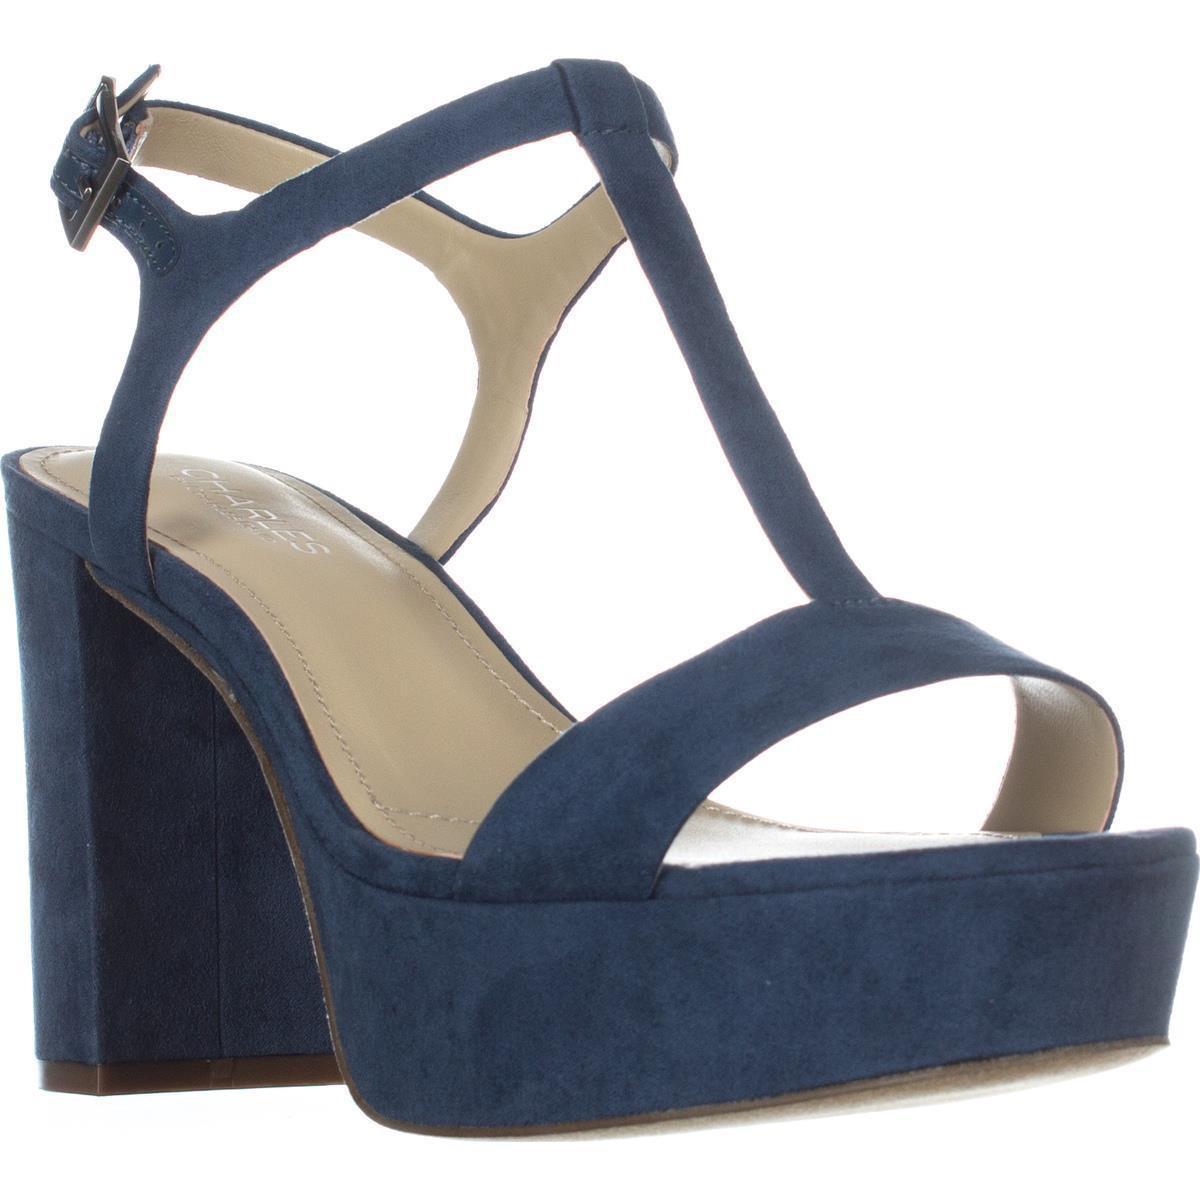 dc4351734cbe Lyst - Charles David Miller T-strap Platform Sandals in Blue